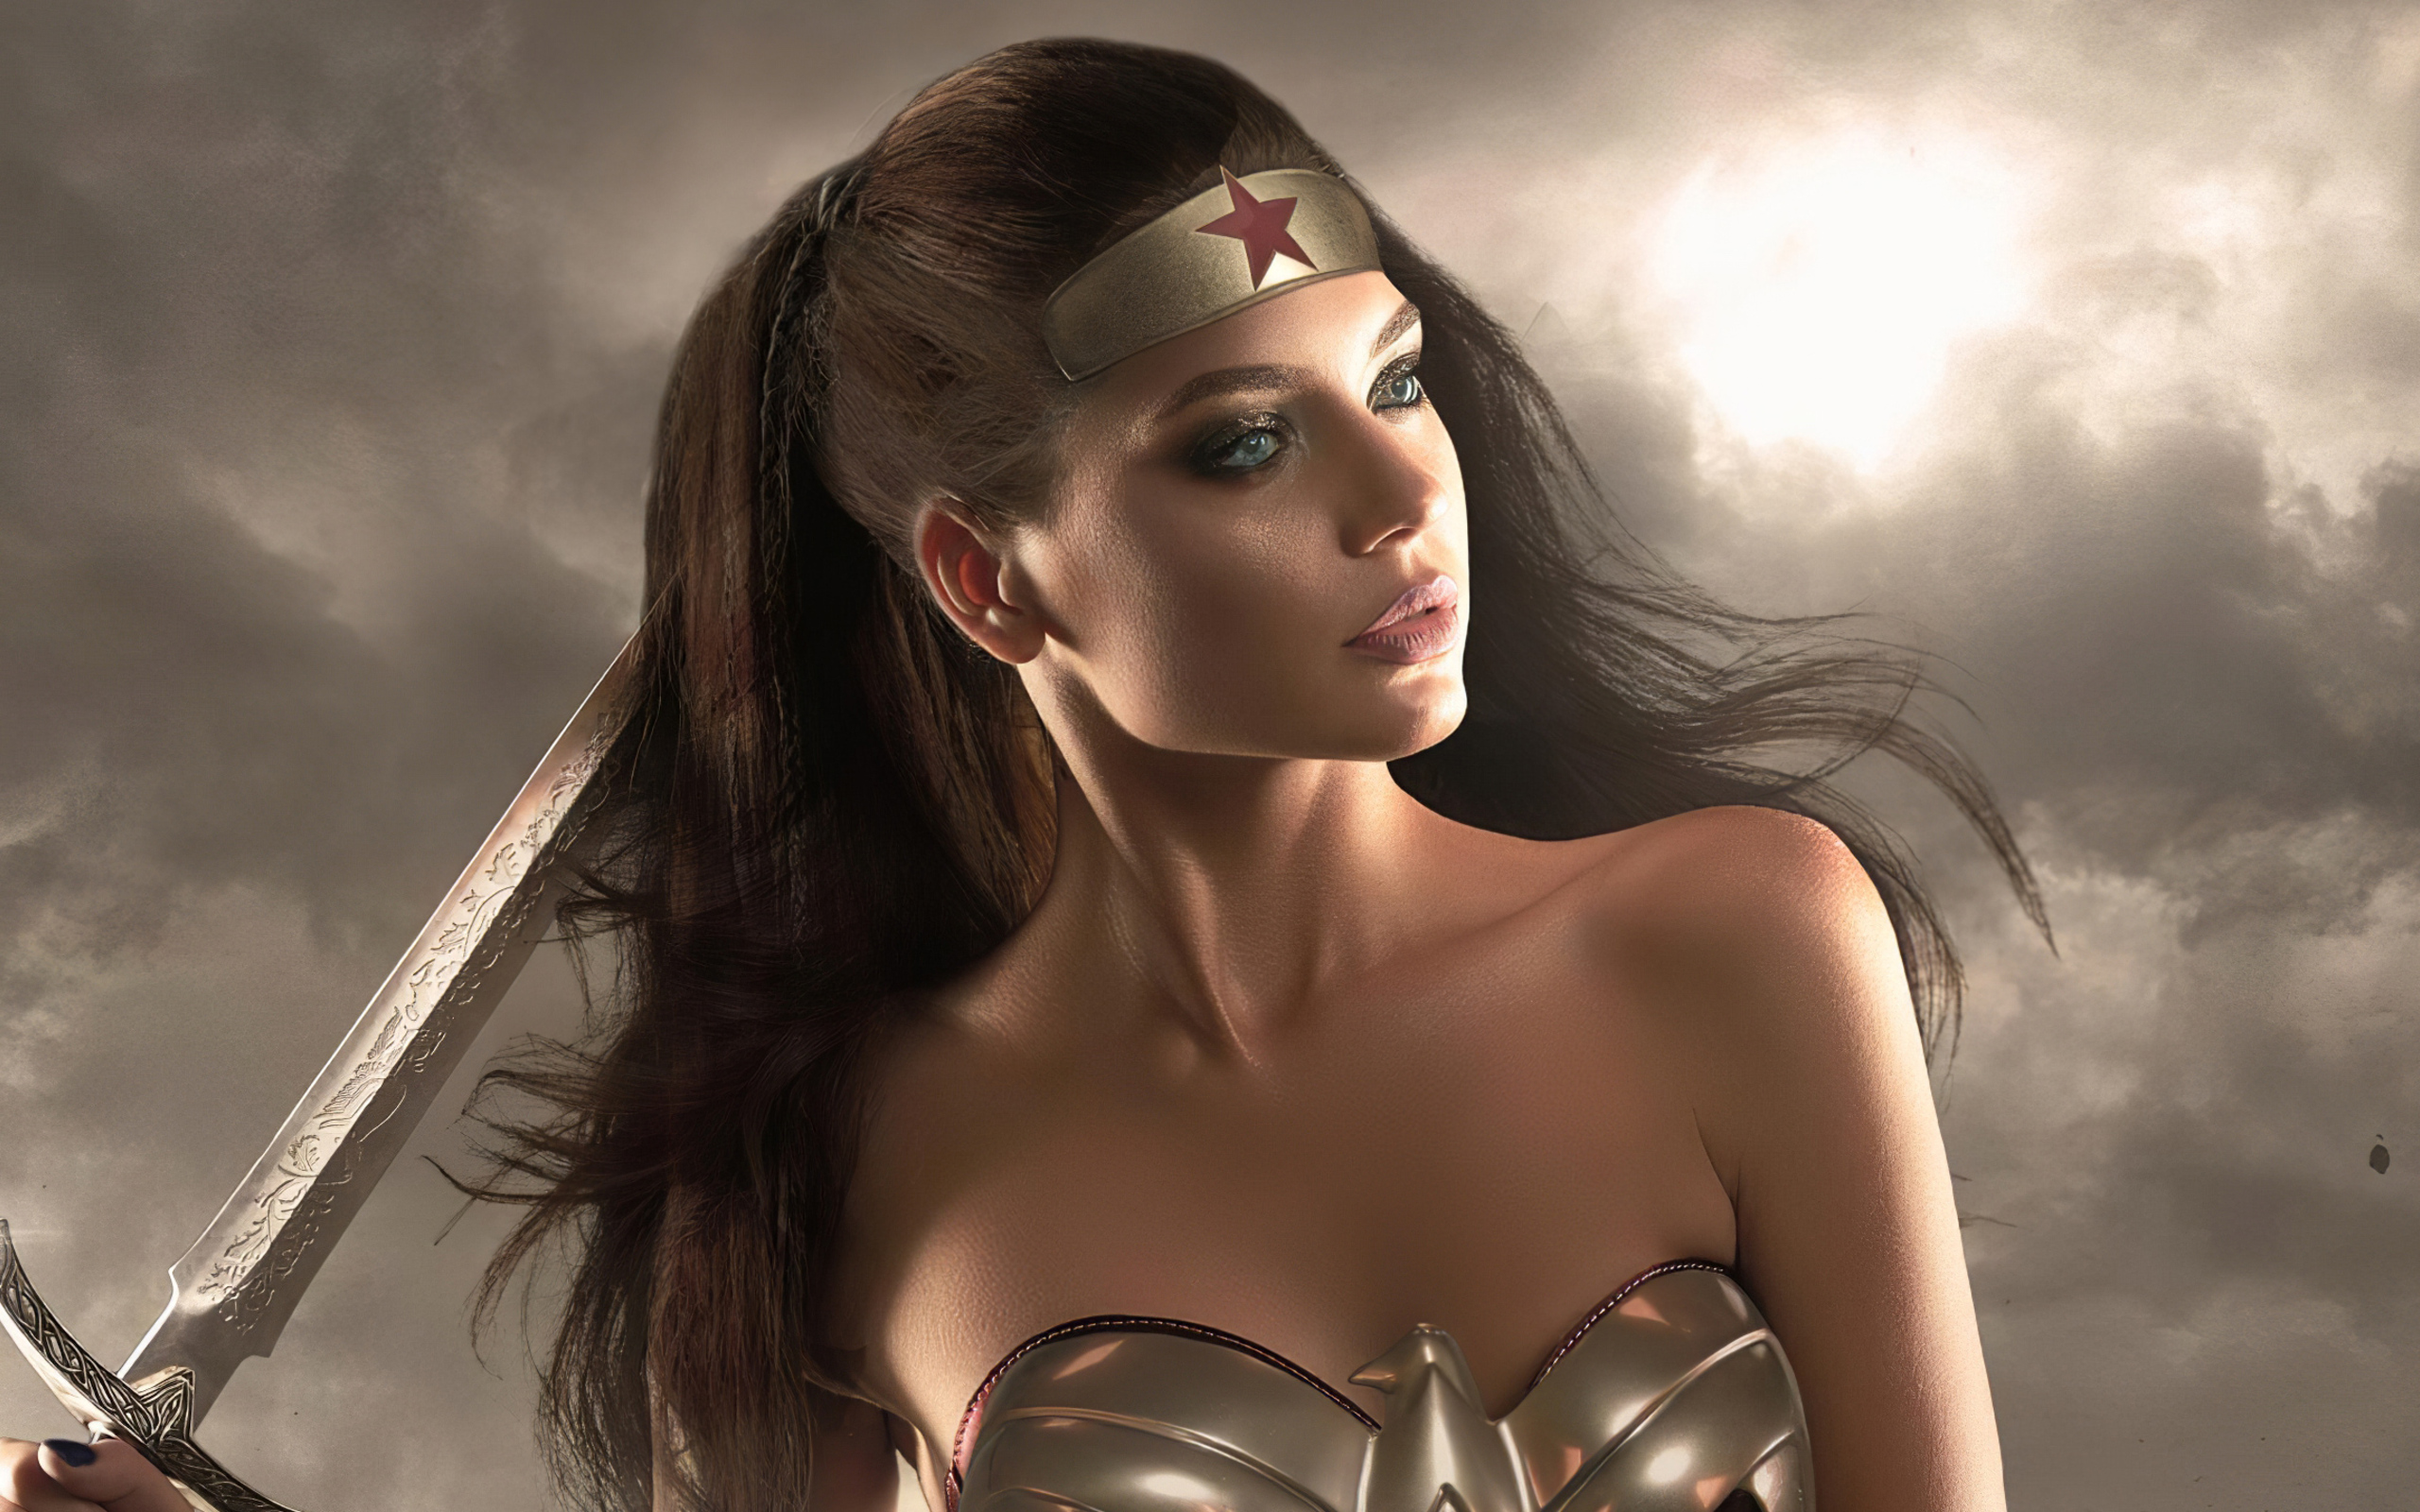 wonder-woman-new-cosplay-2020-l9.jpg